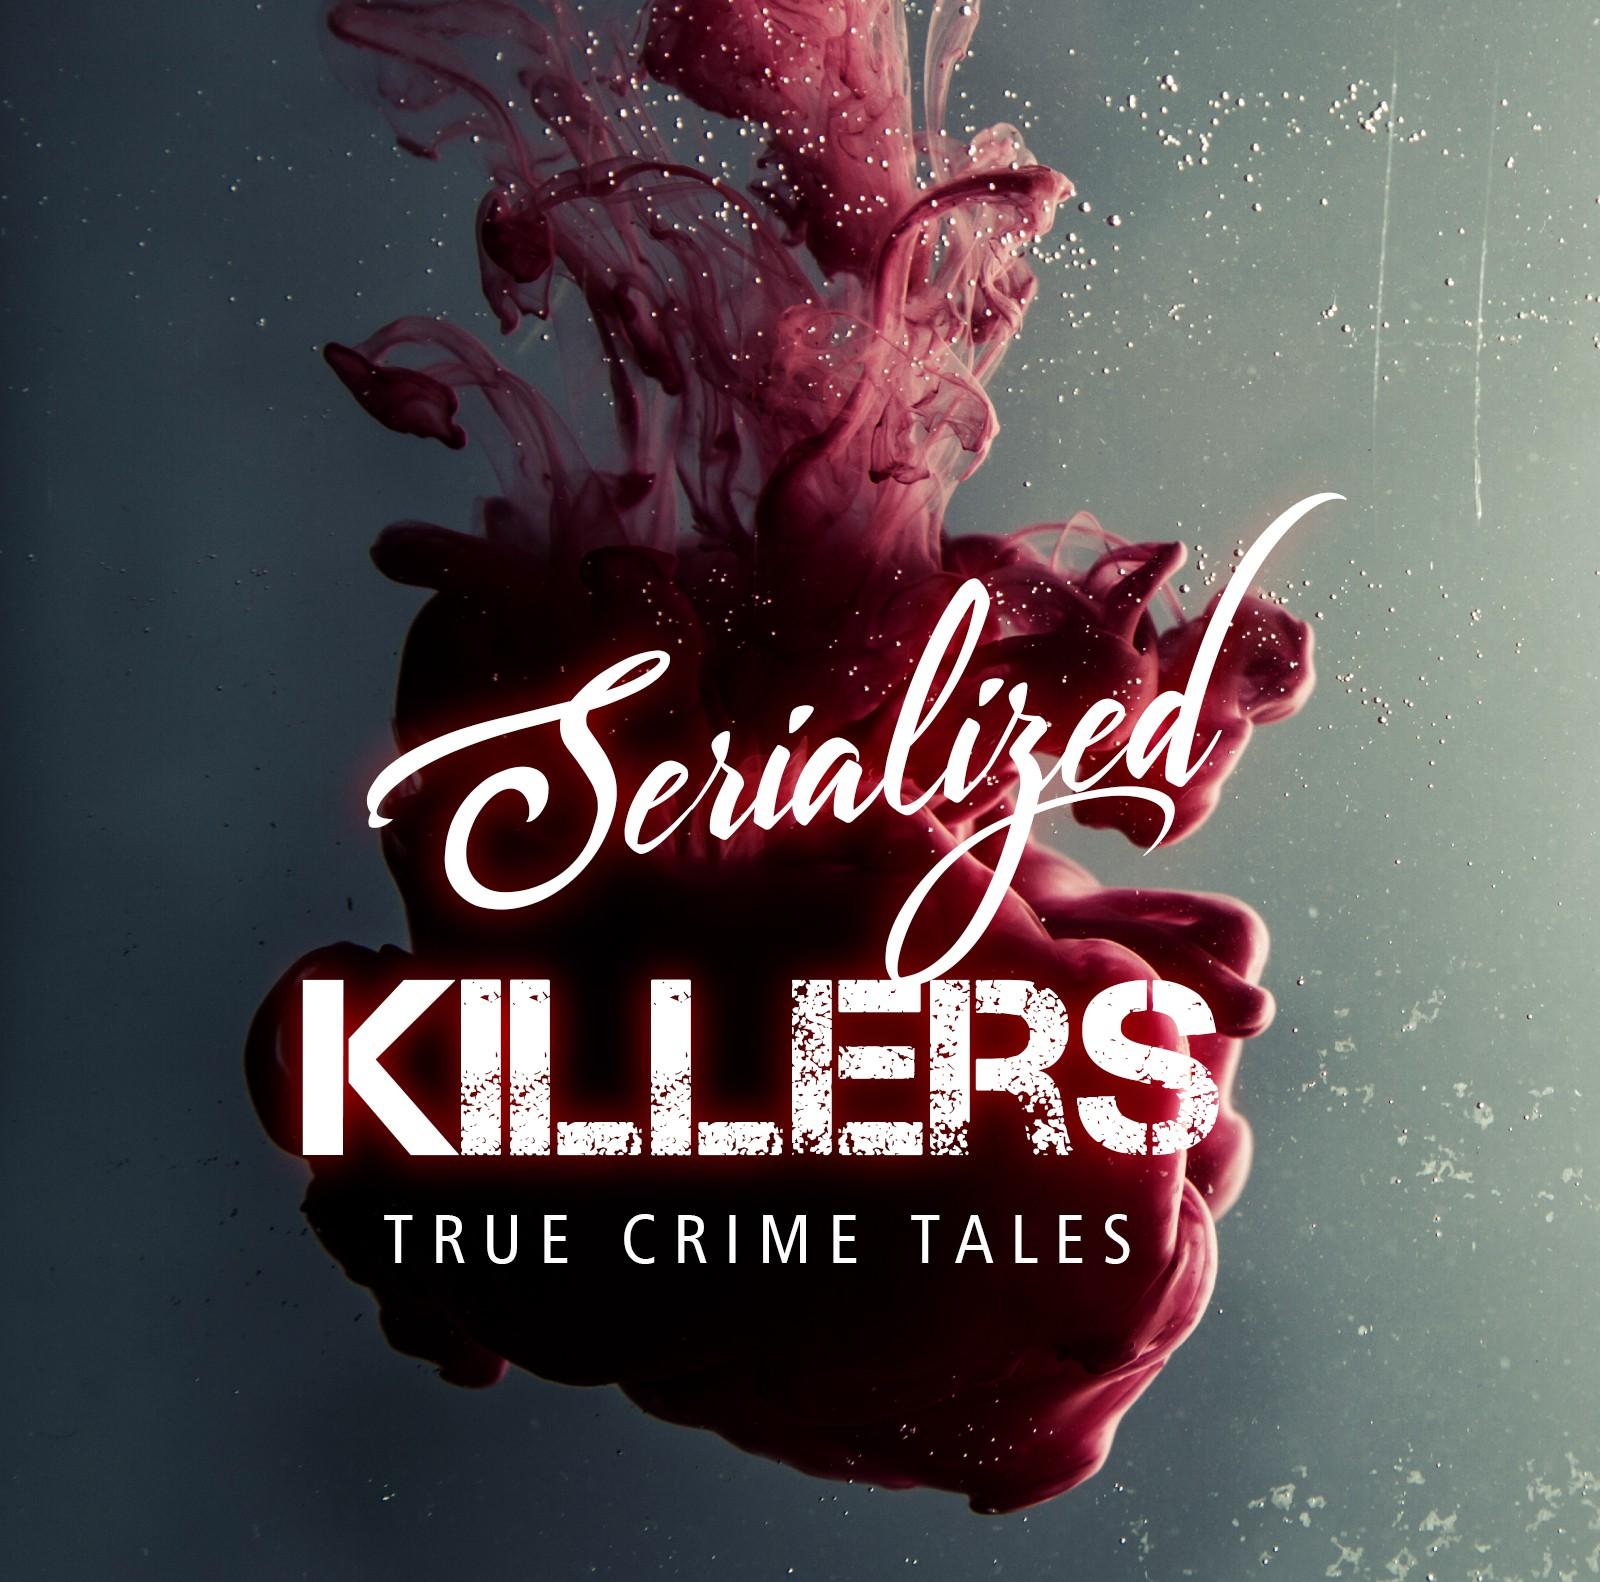 True Crime Podcast Seeks Cover Art